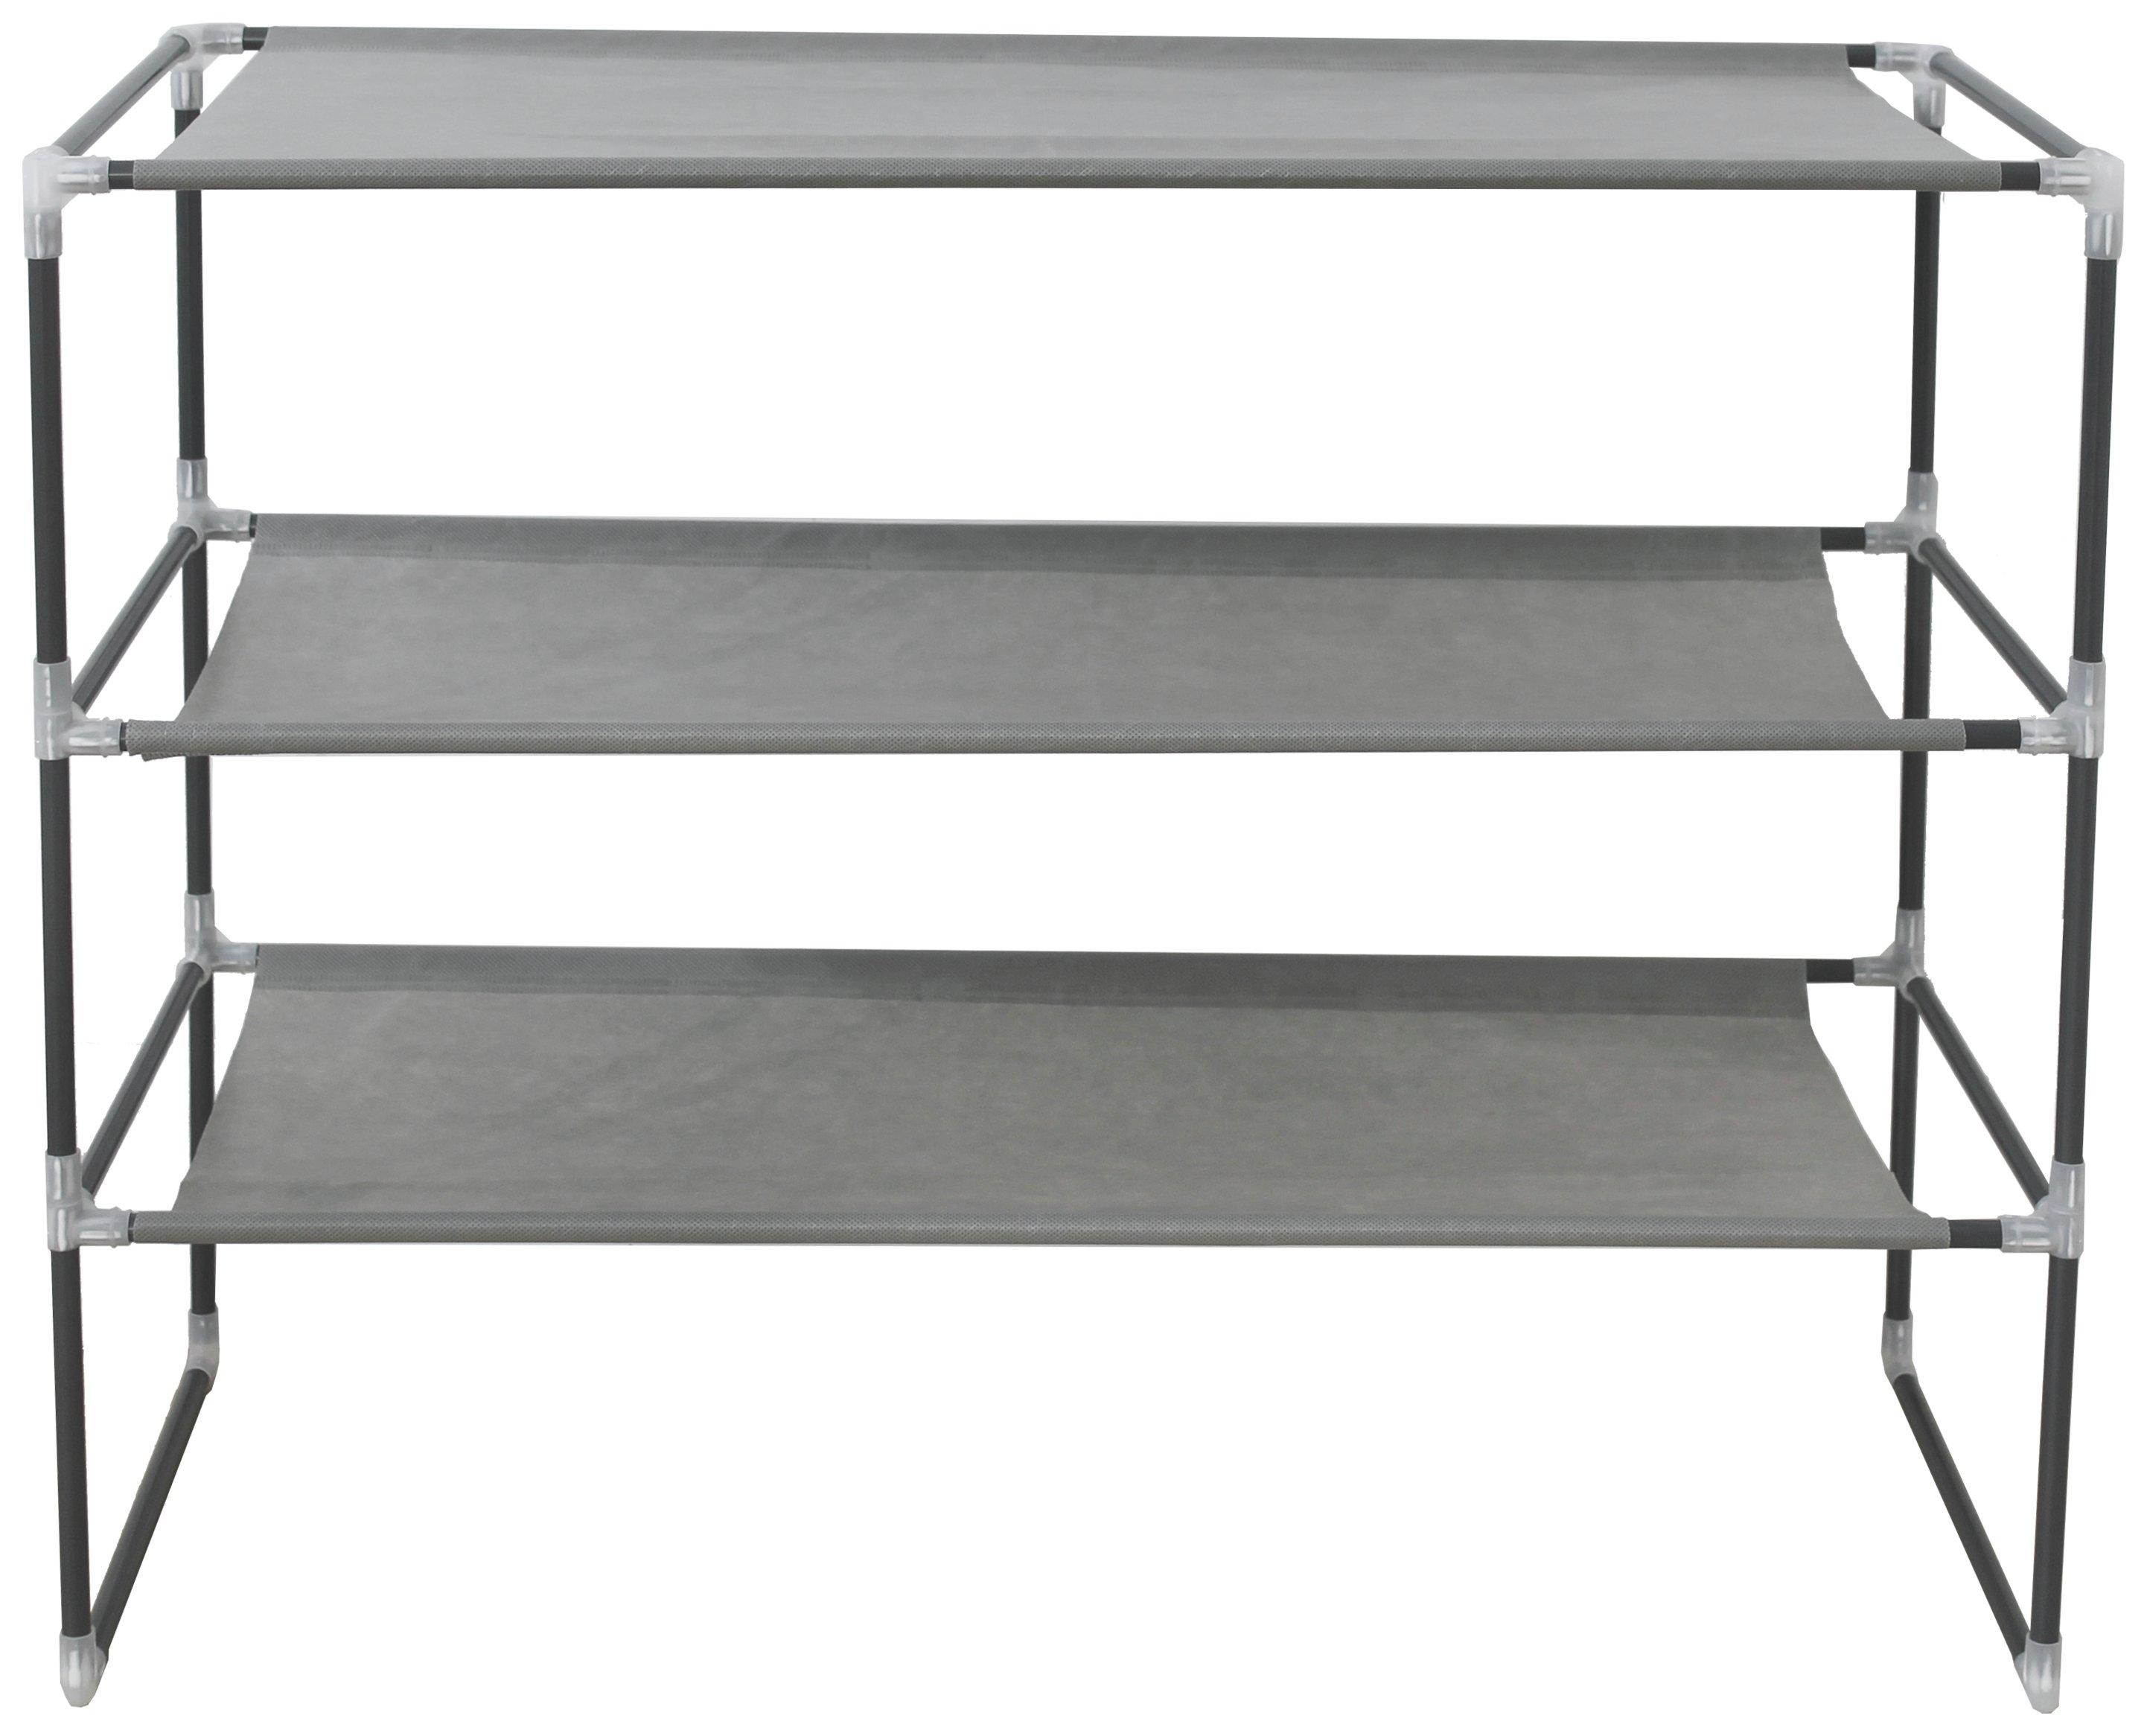 Argos Home 3 Shelf Stackable Fabric Shoe Storage Rack - Grey